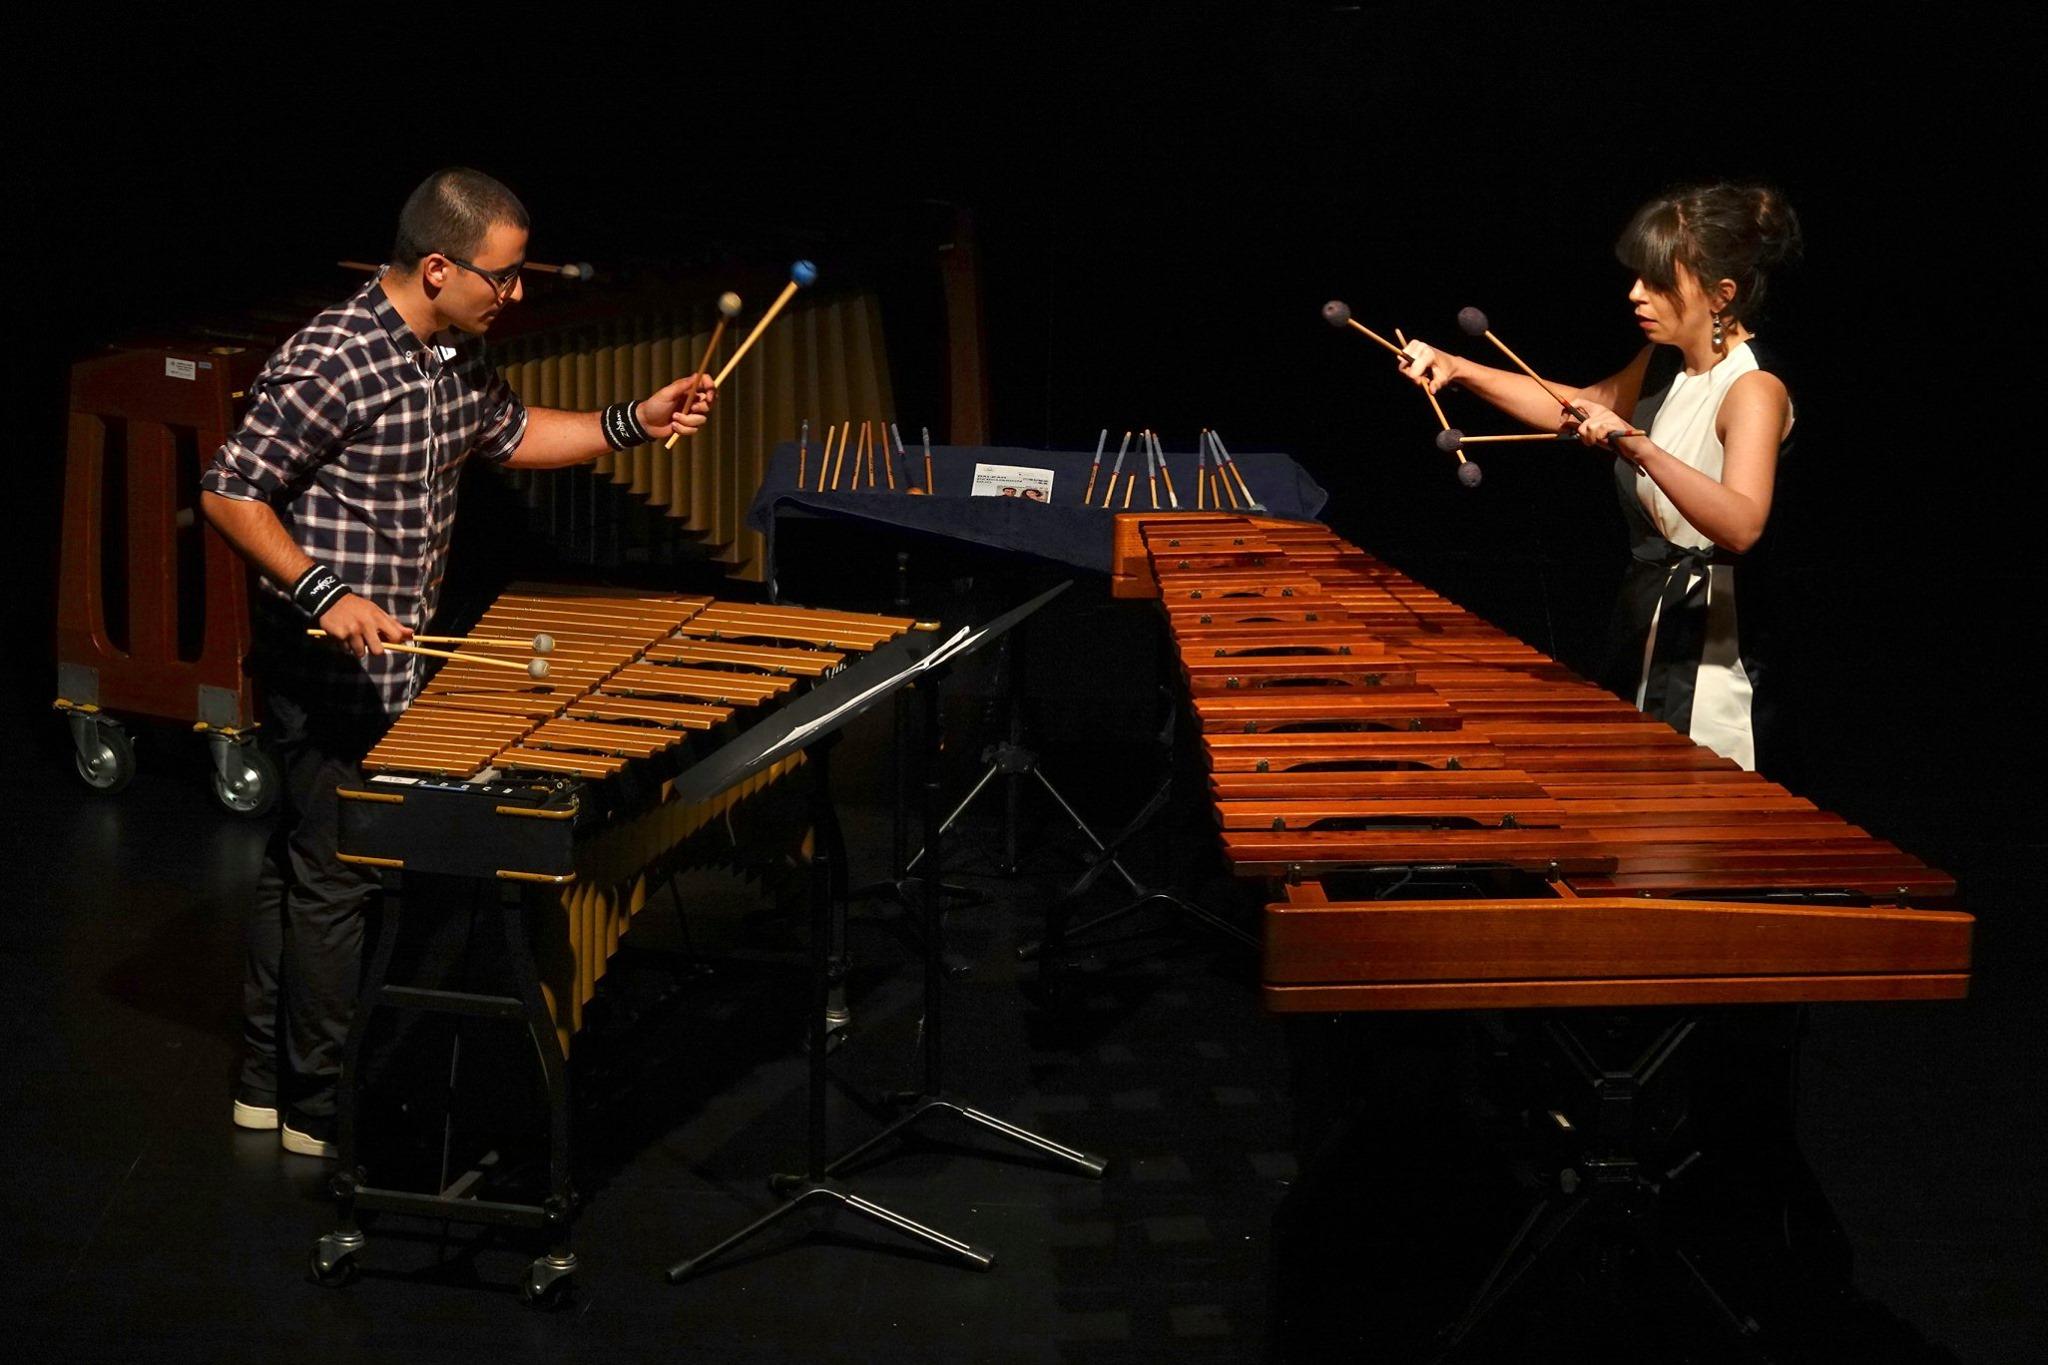 Hong Kong Performance (courtesy of Toolbox Percussion)